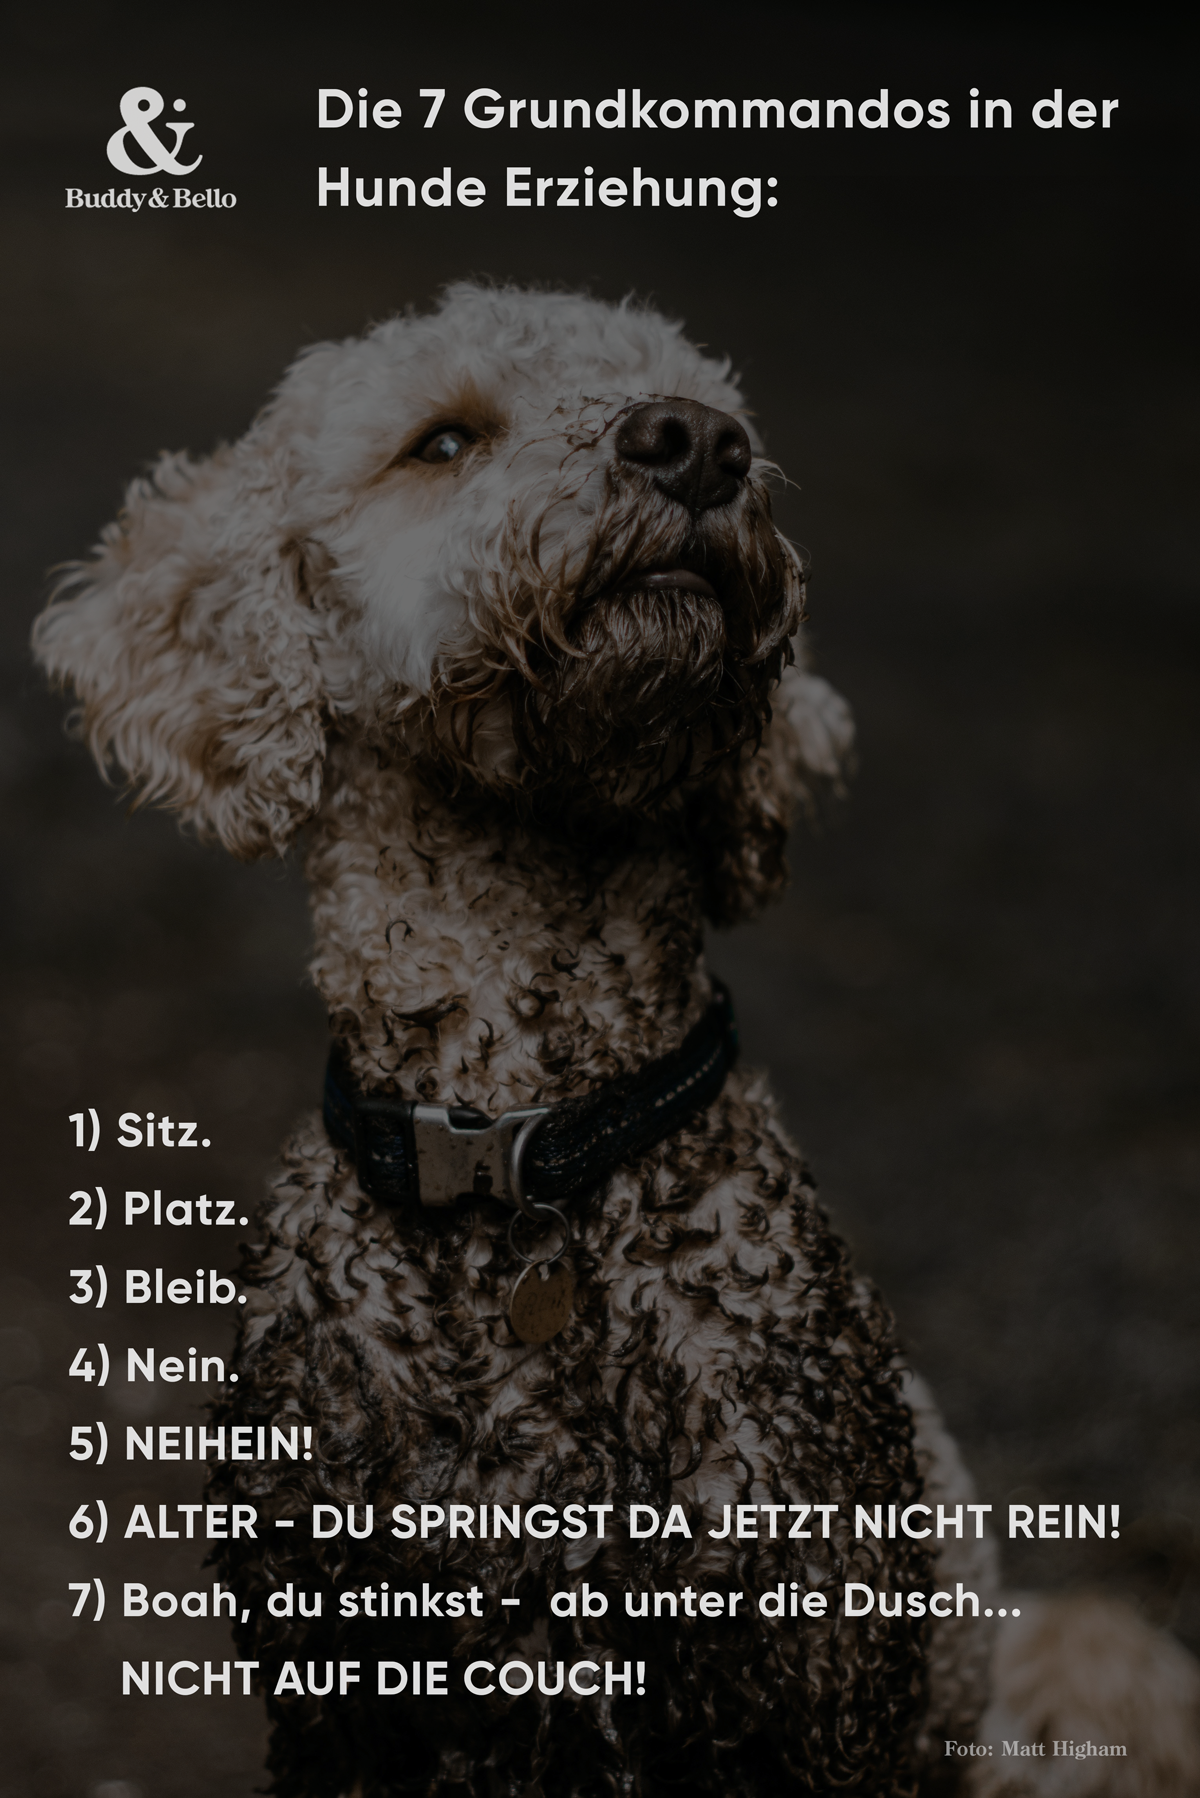 Hundespruche Buddy Bello In 2020 Hundeausbildung Hundespruche Hunde